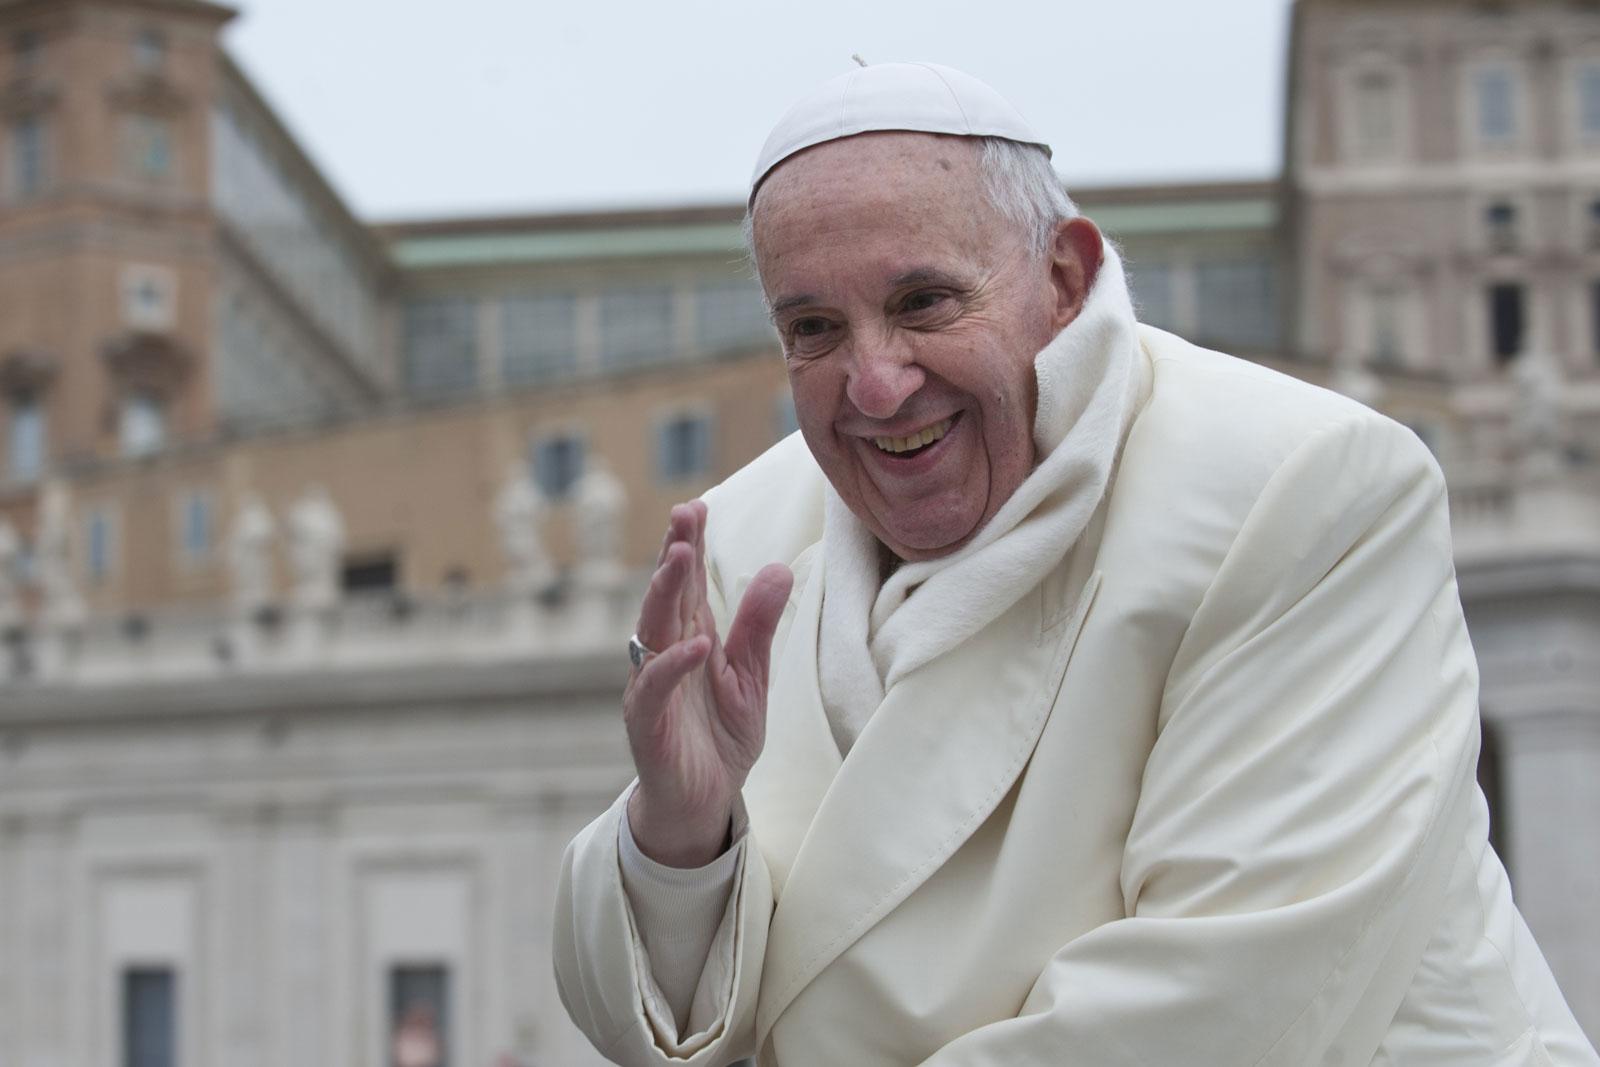 Papstaudienz mit Papst Fr